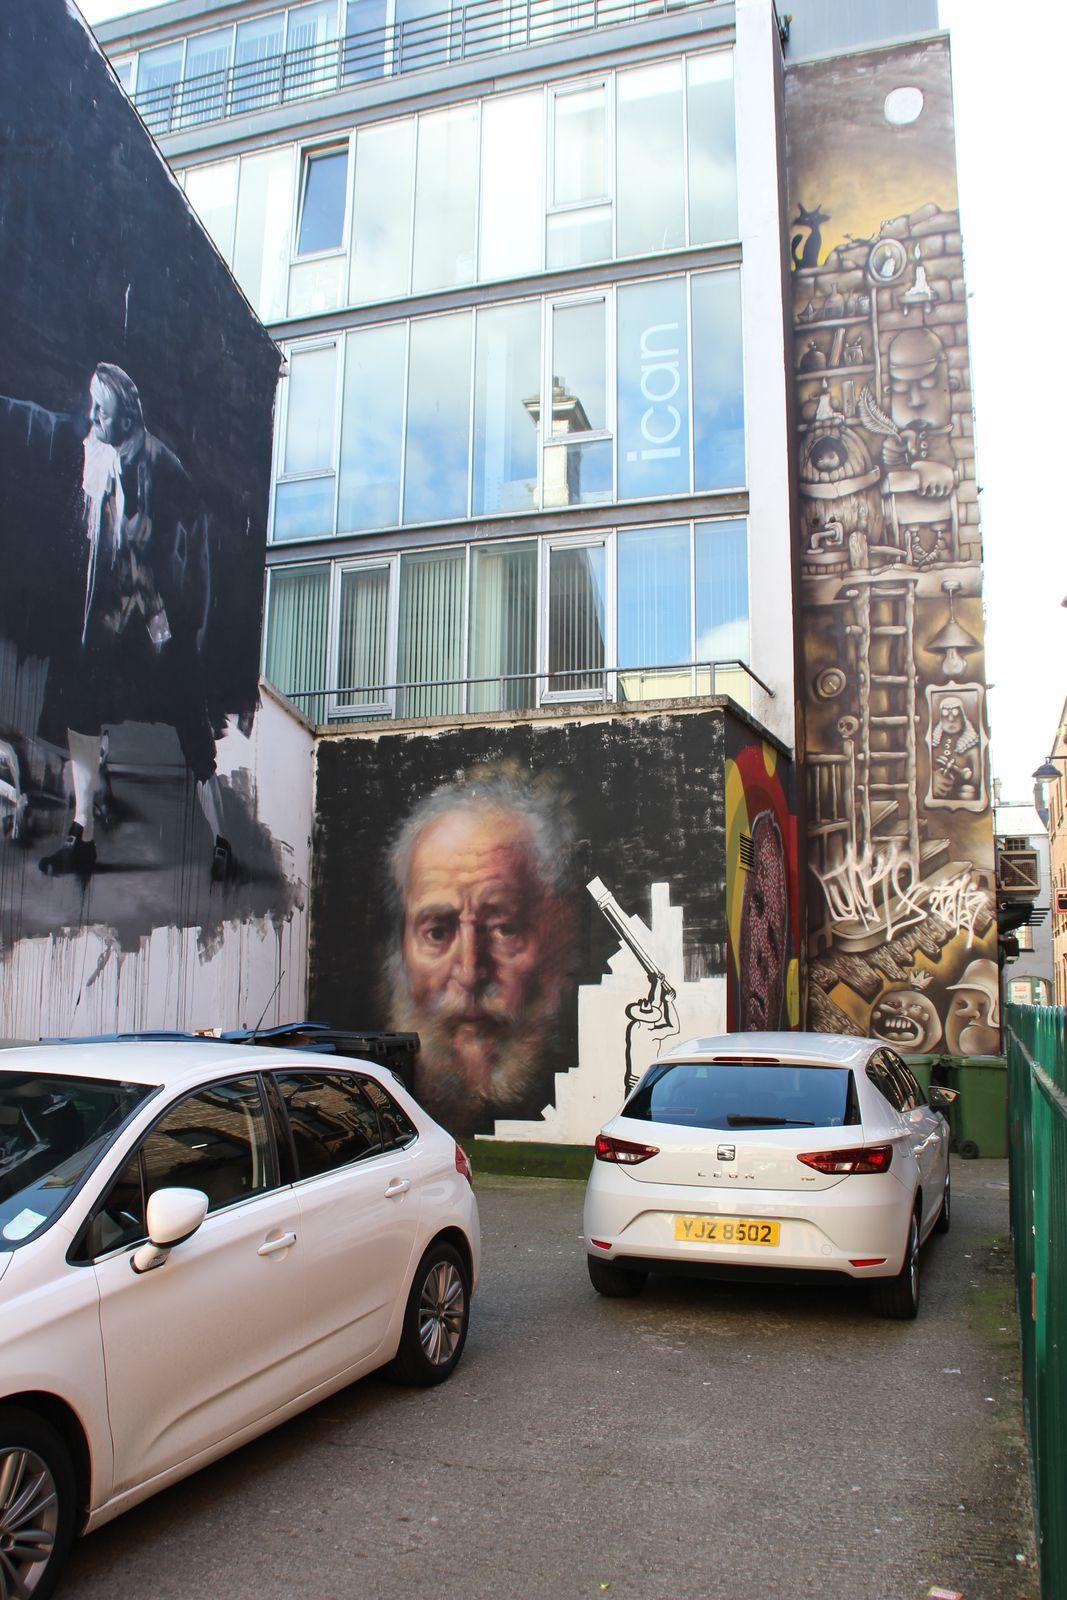 758) City Centre, Belfast